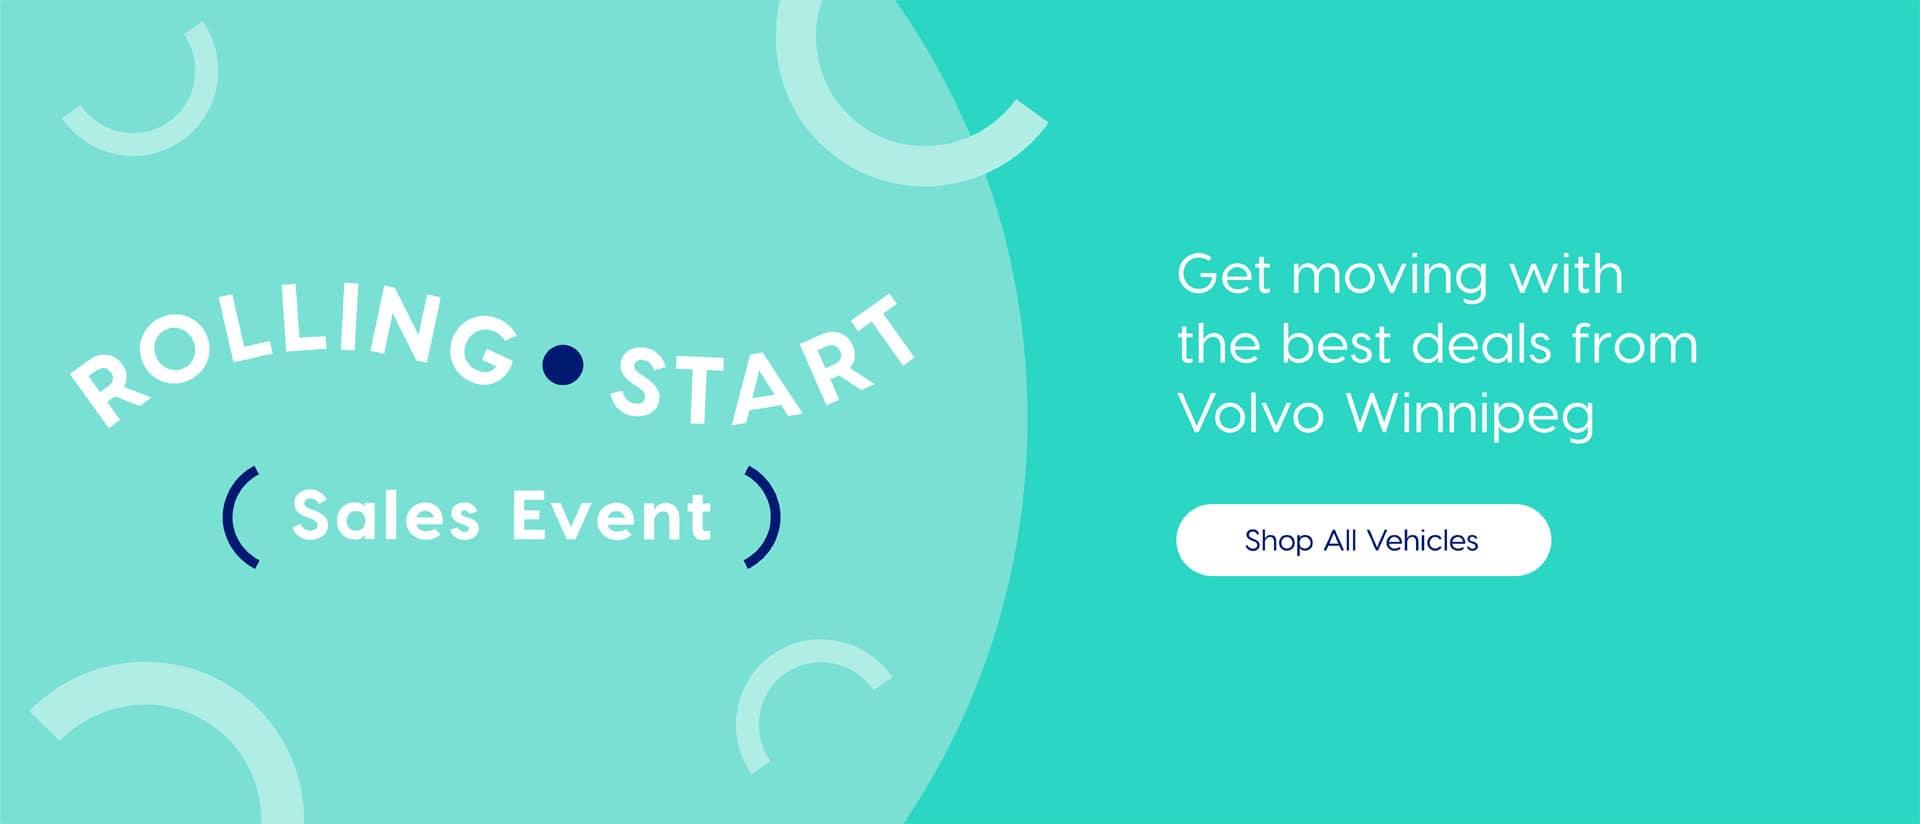 Volvo Winnipeg rolling Start Sales Event